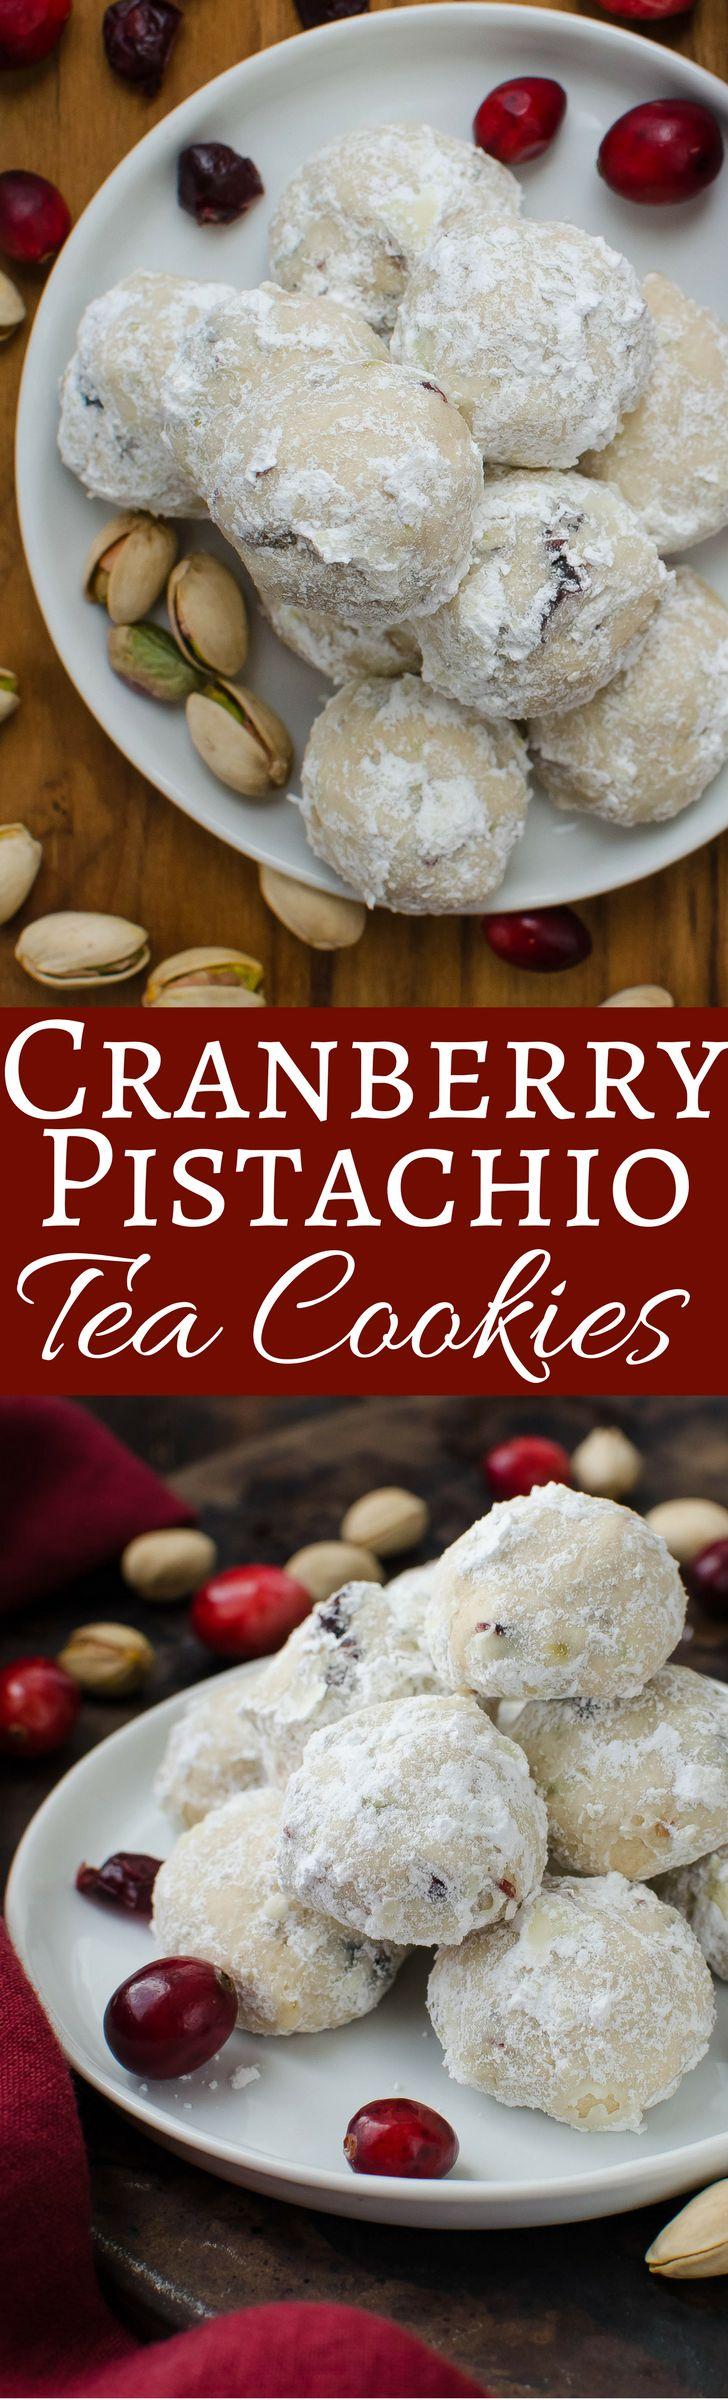 cranberry pistachio tea cookies